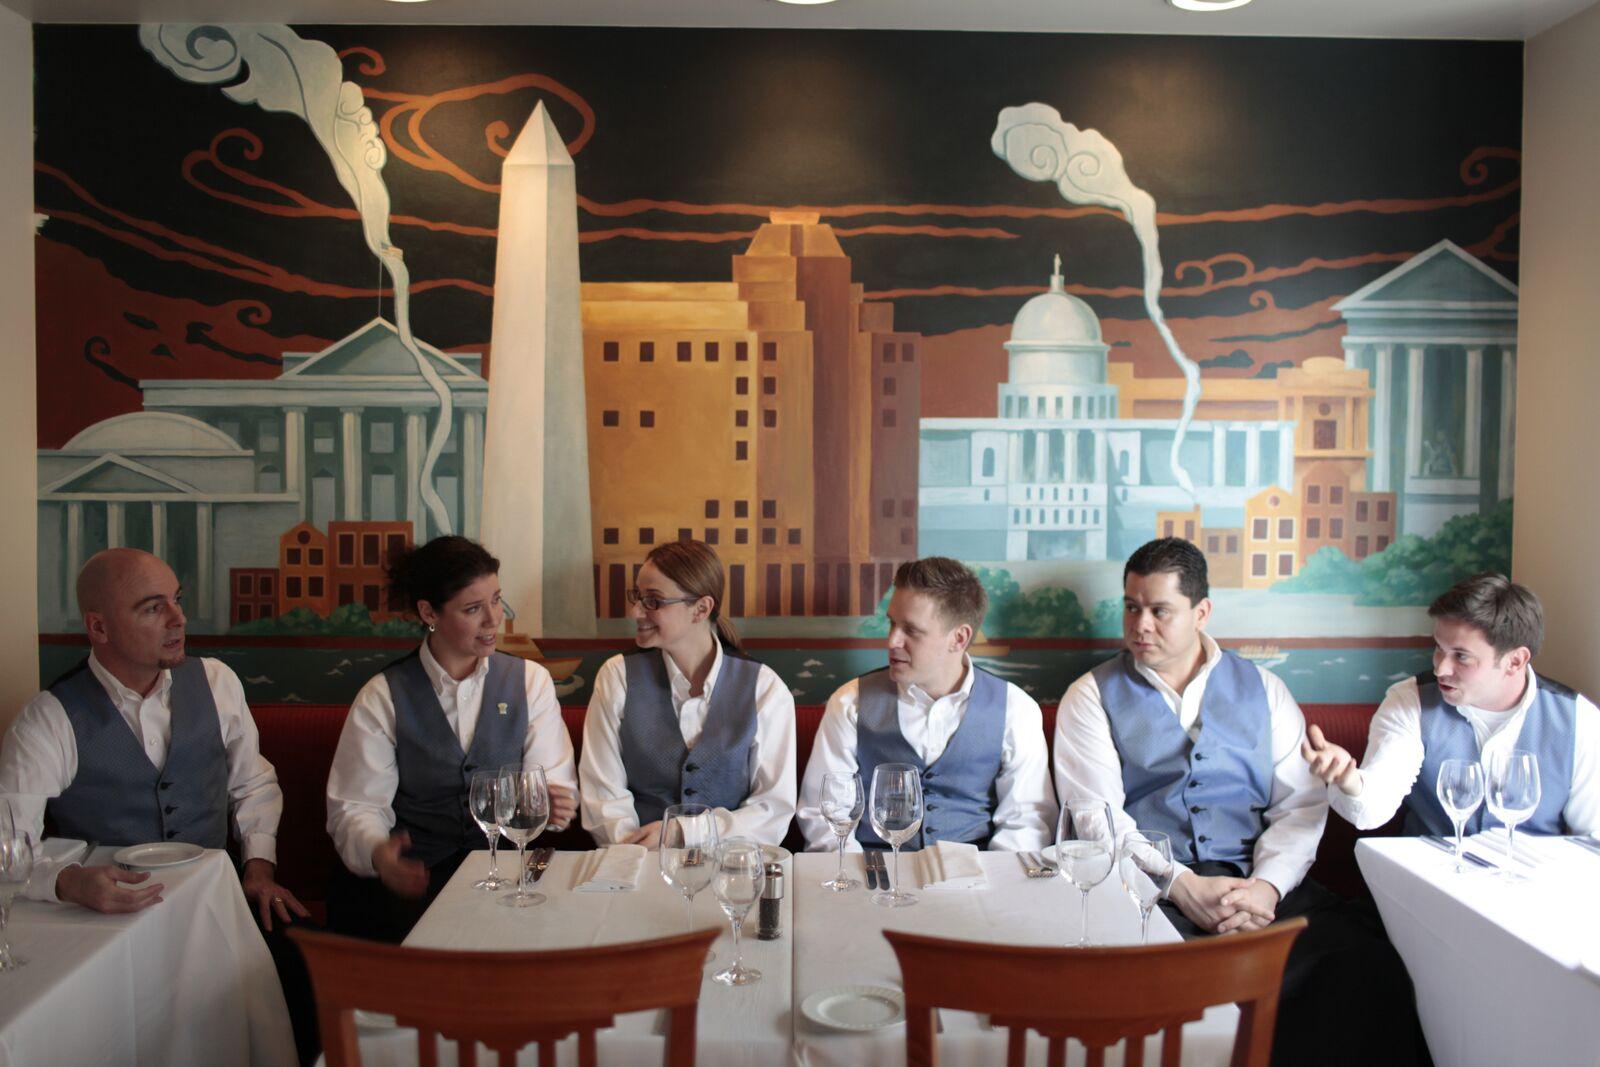 Servers at DC Coast in Washington, DC